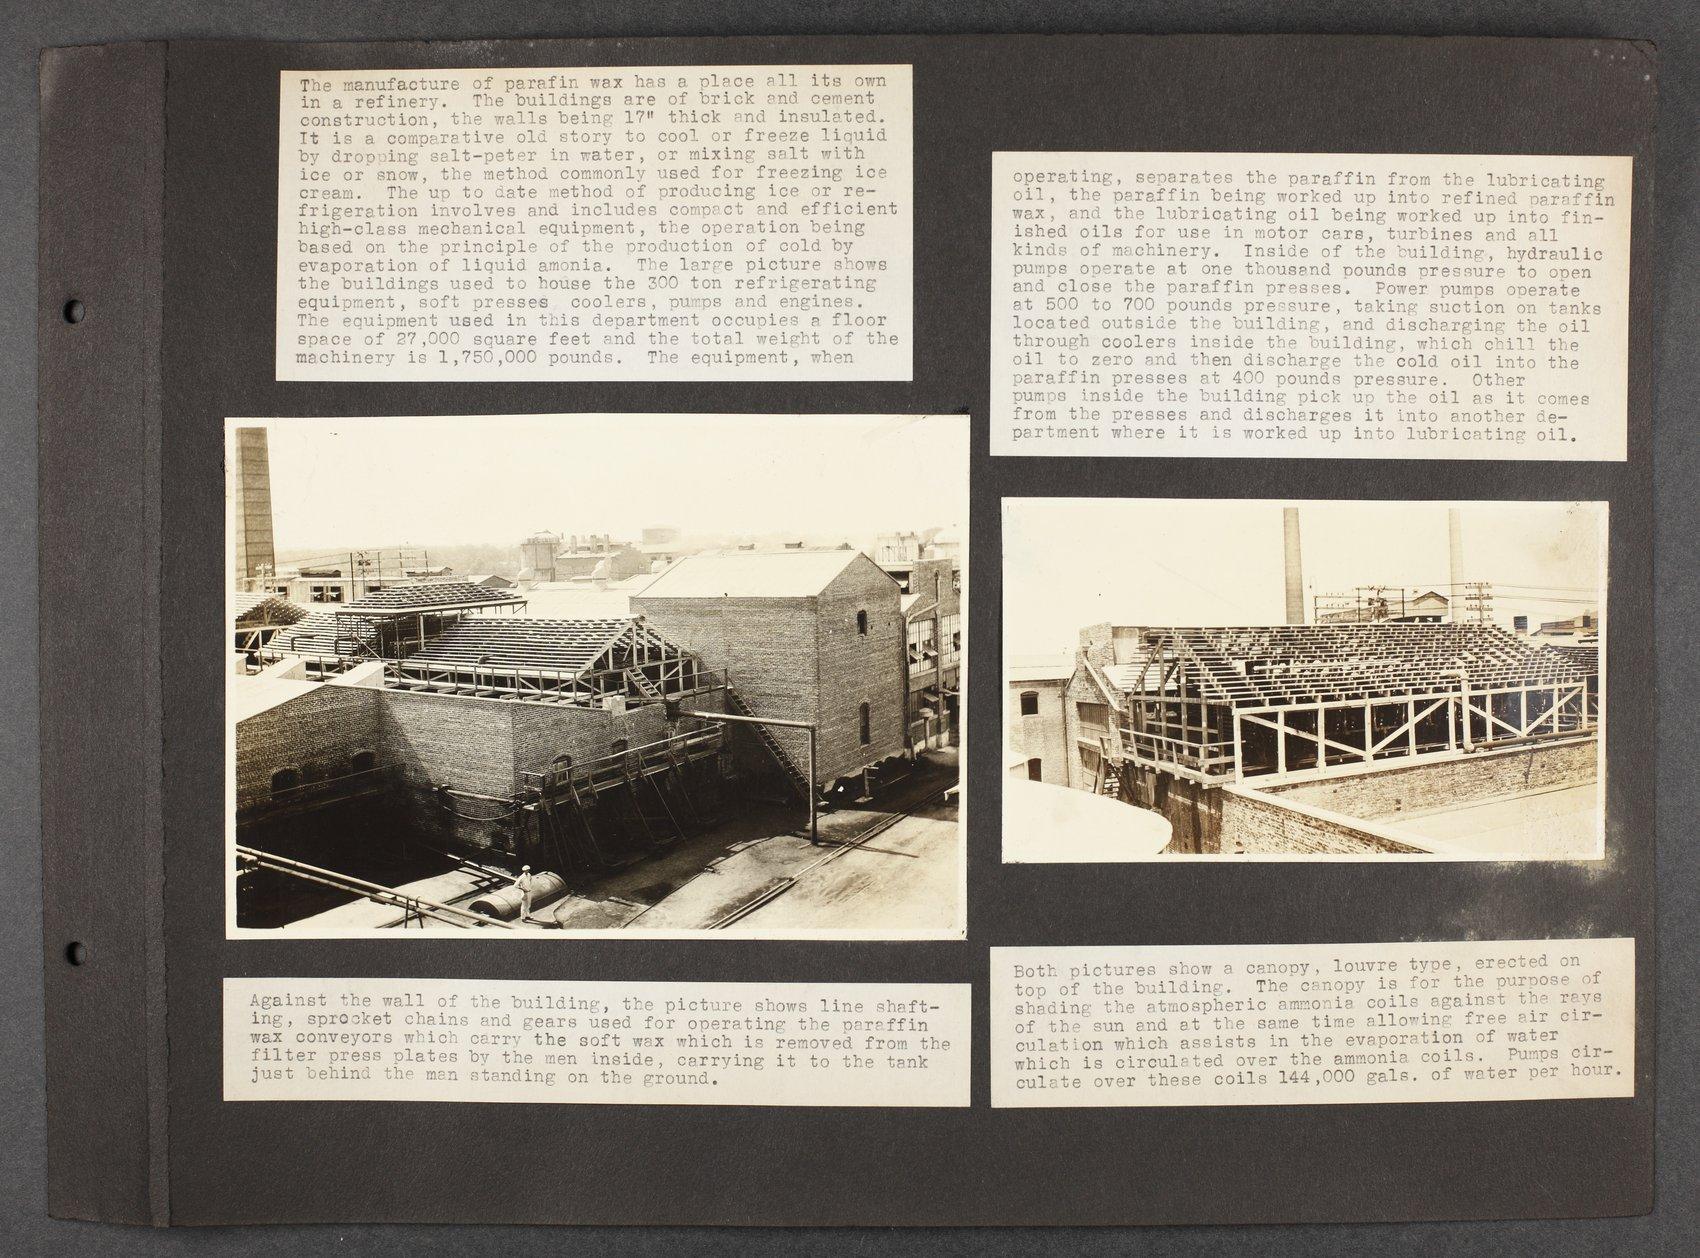 National Refining Company, Coffeyville, Kansas - 13